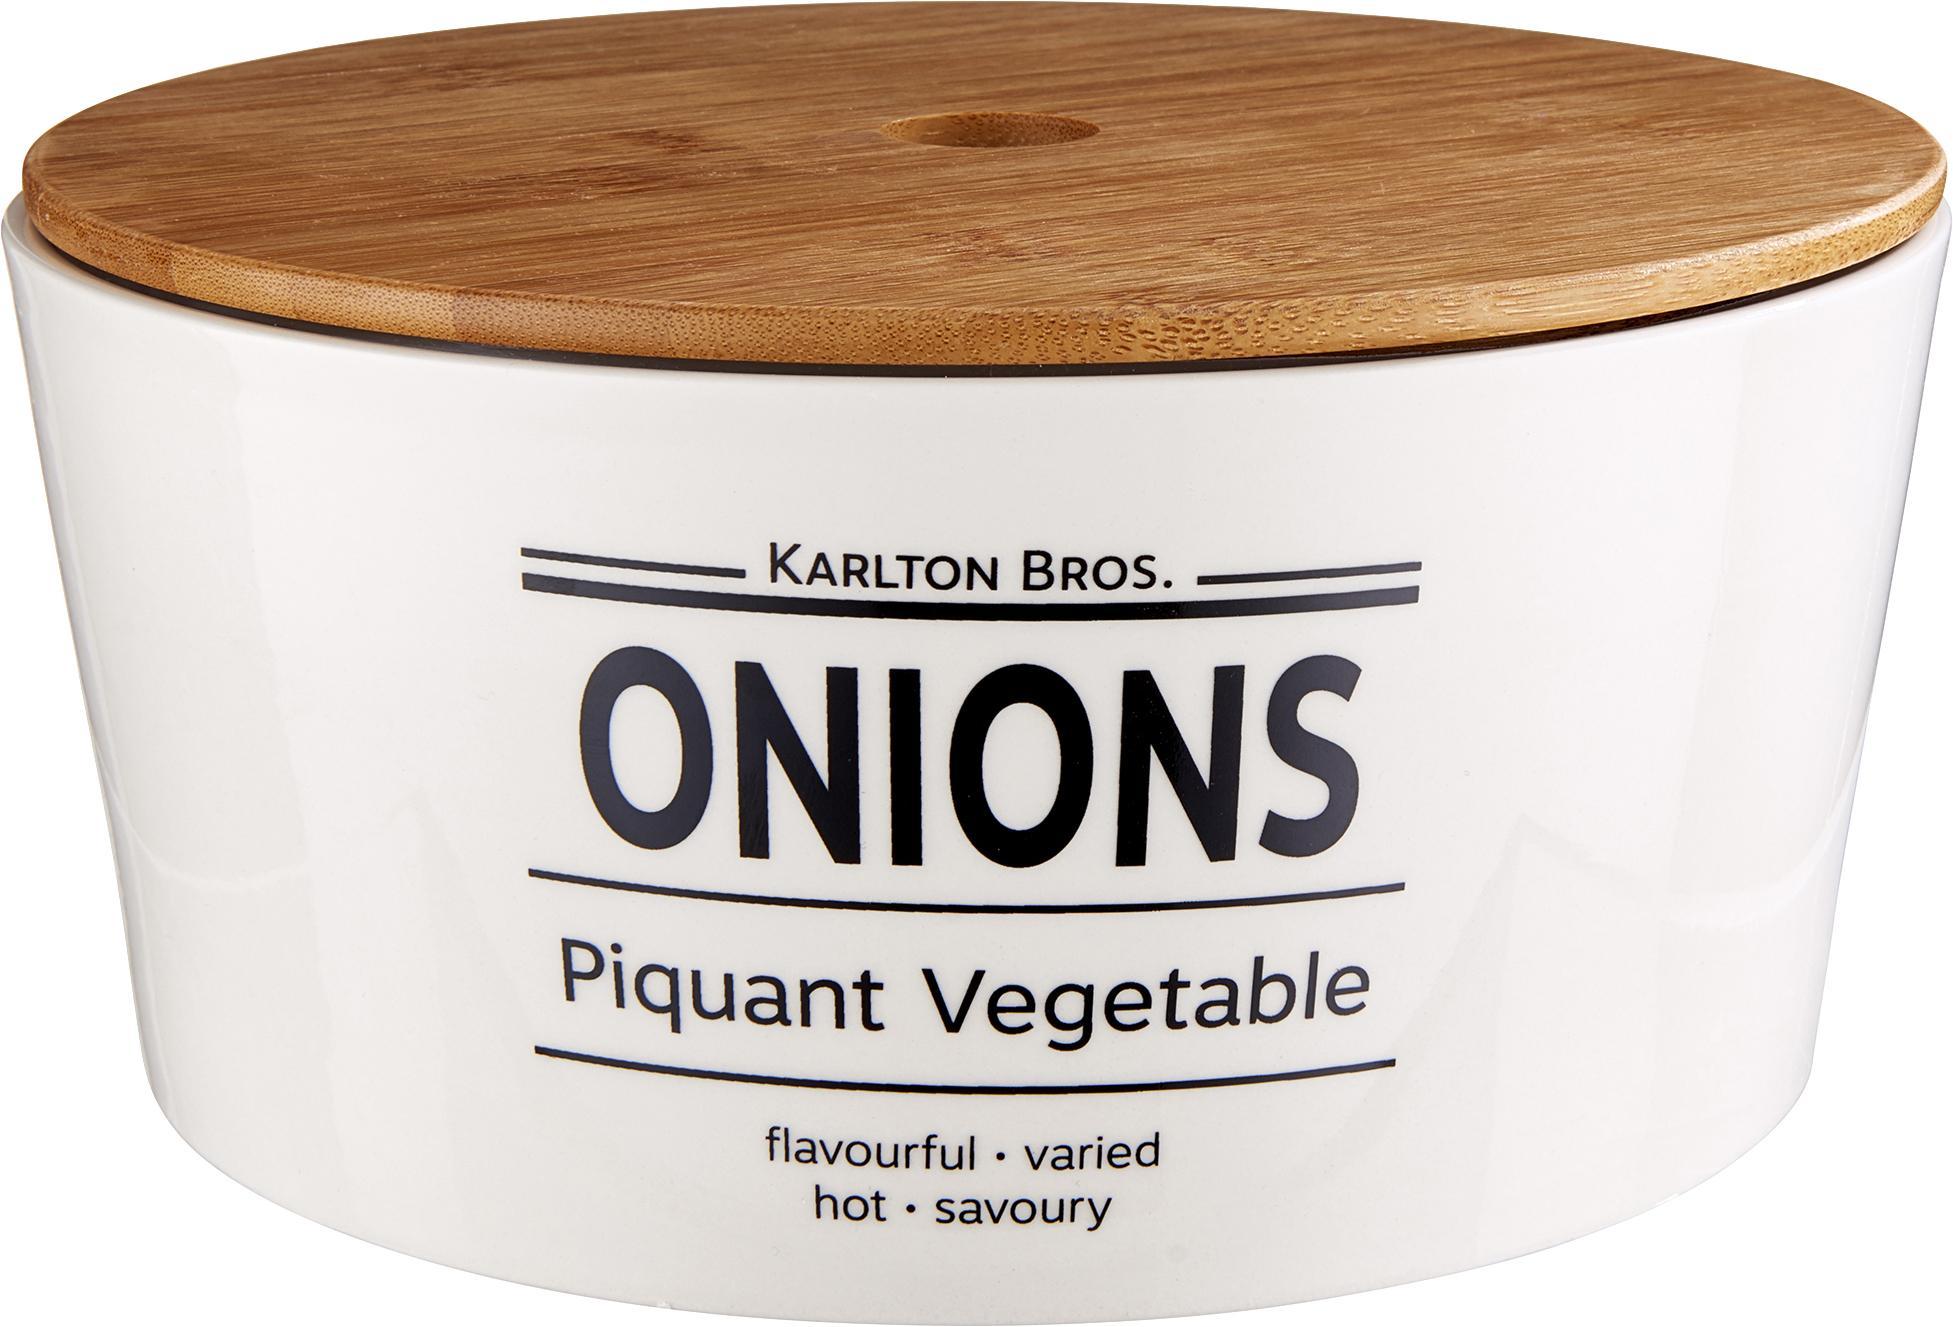 Bote Karlton Bros. Onions, Porcelana, Blanco, negro, marrón, Ø 22 x Al 11 cm